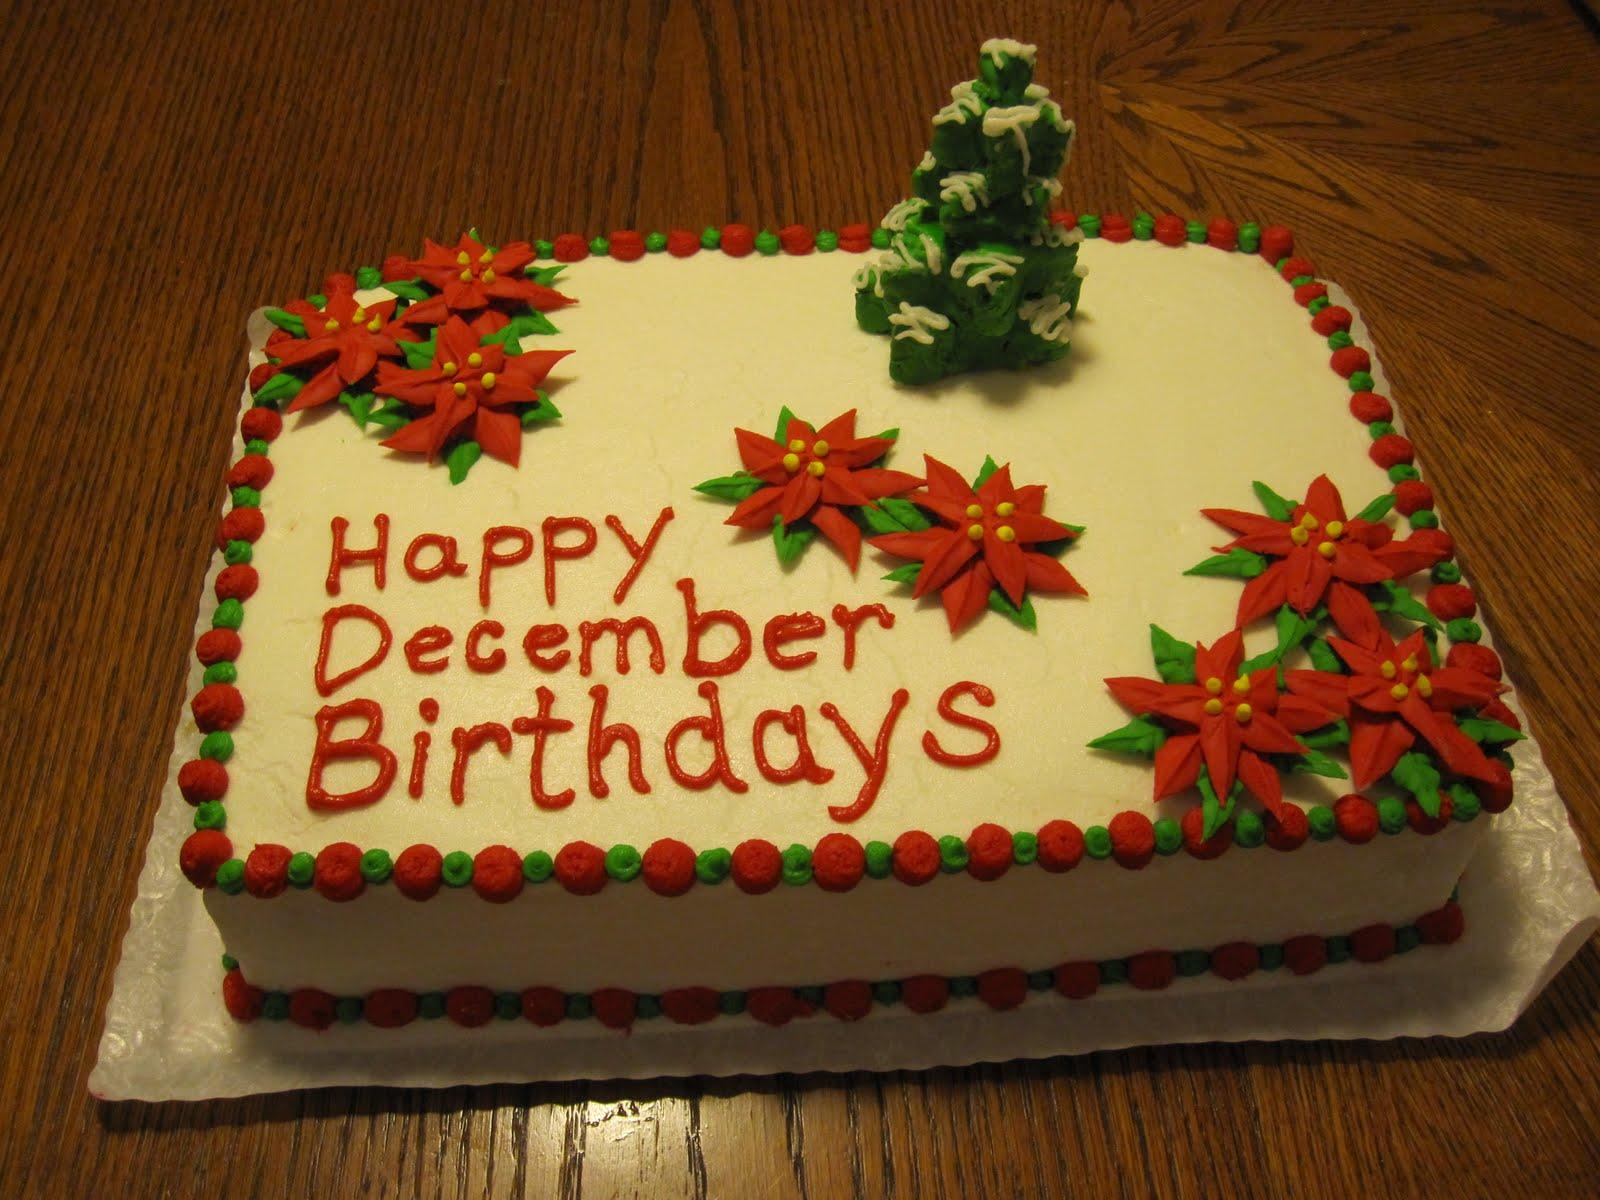 Happy Birthday December Happy Birthday to all the